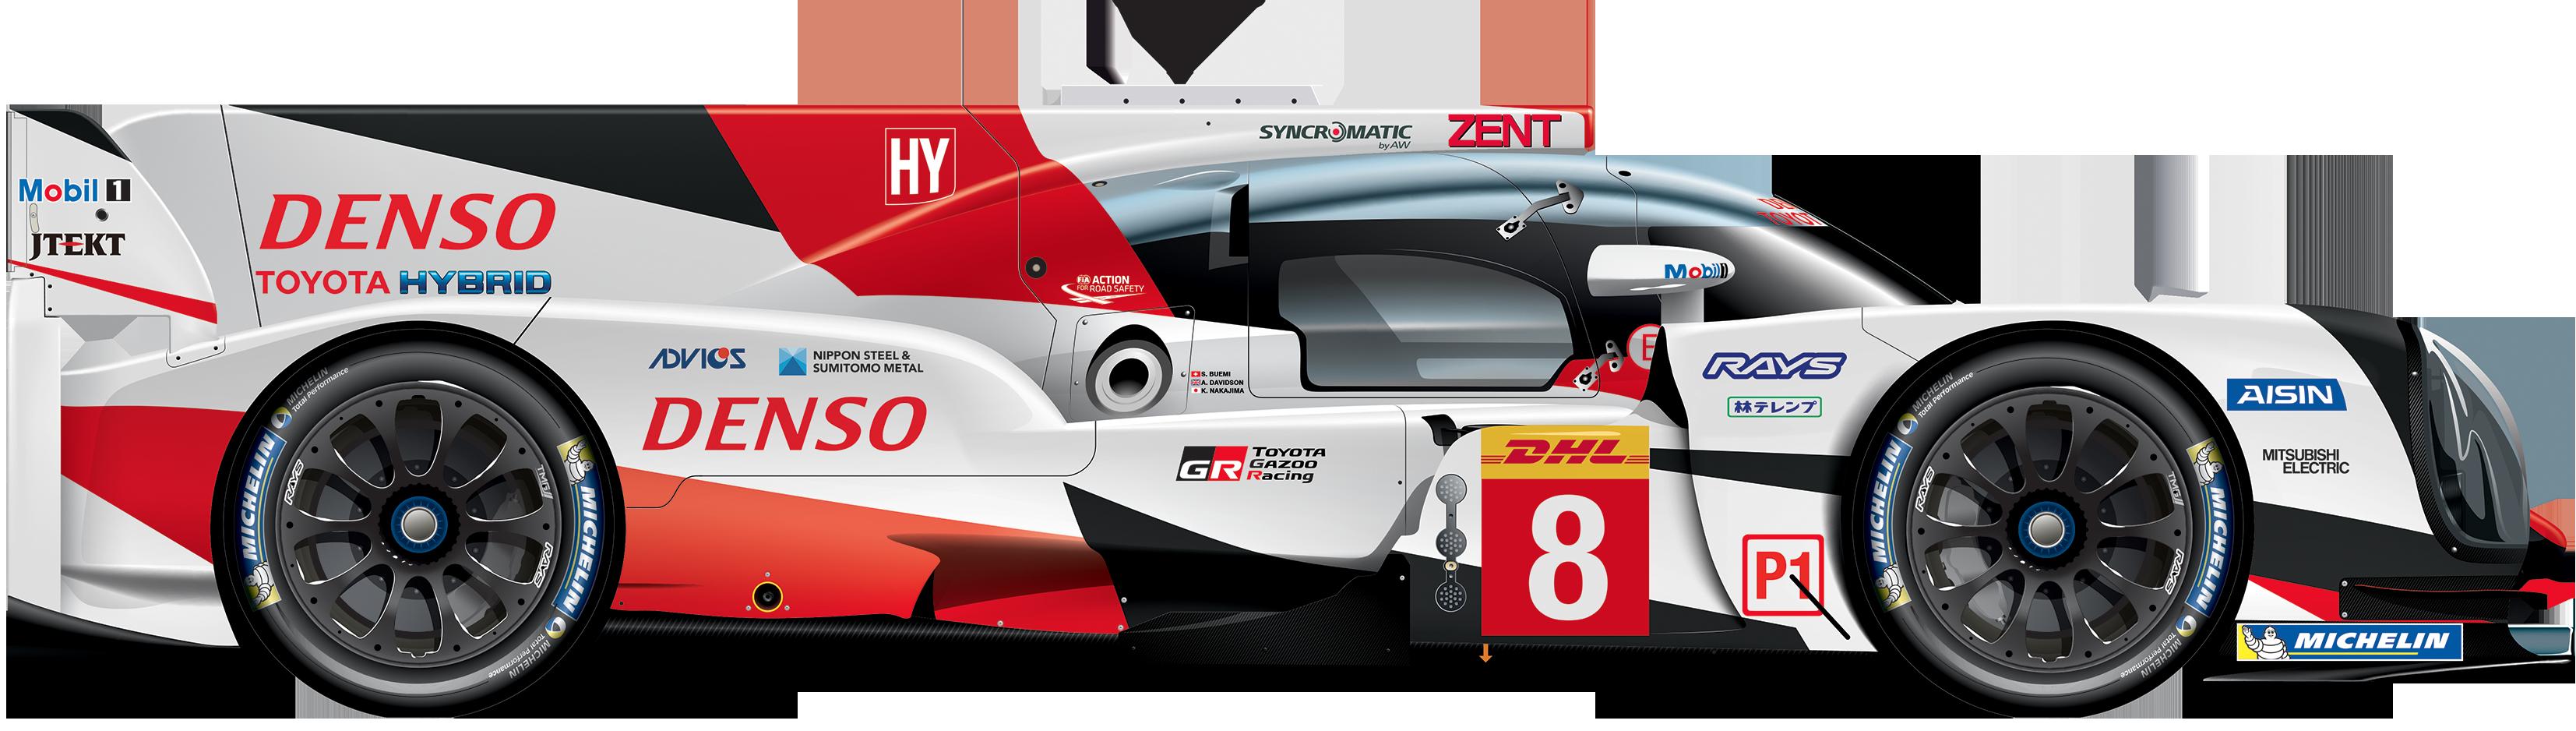 Toyota 86 Livery >> #8 - Toyota TS050 - Hybrid - FIA World Endurance Championship